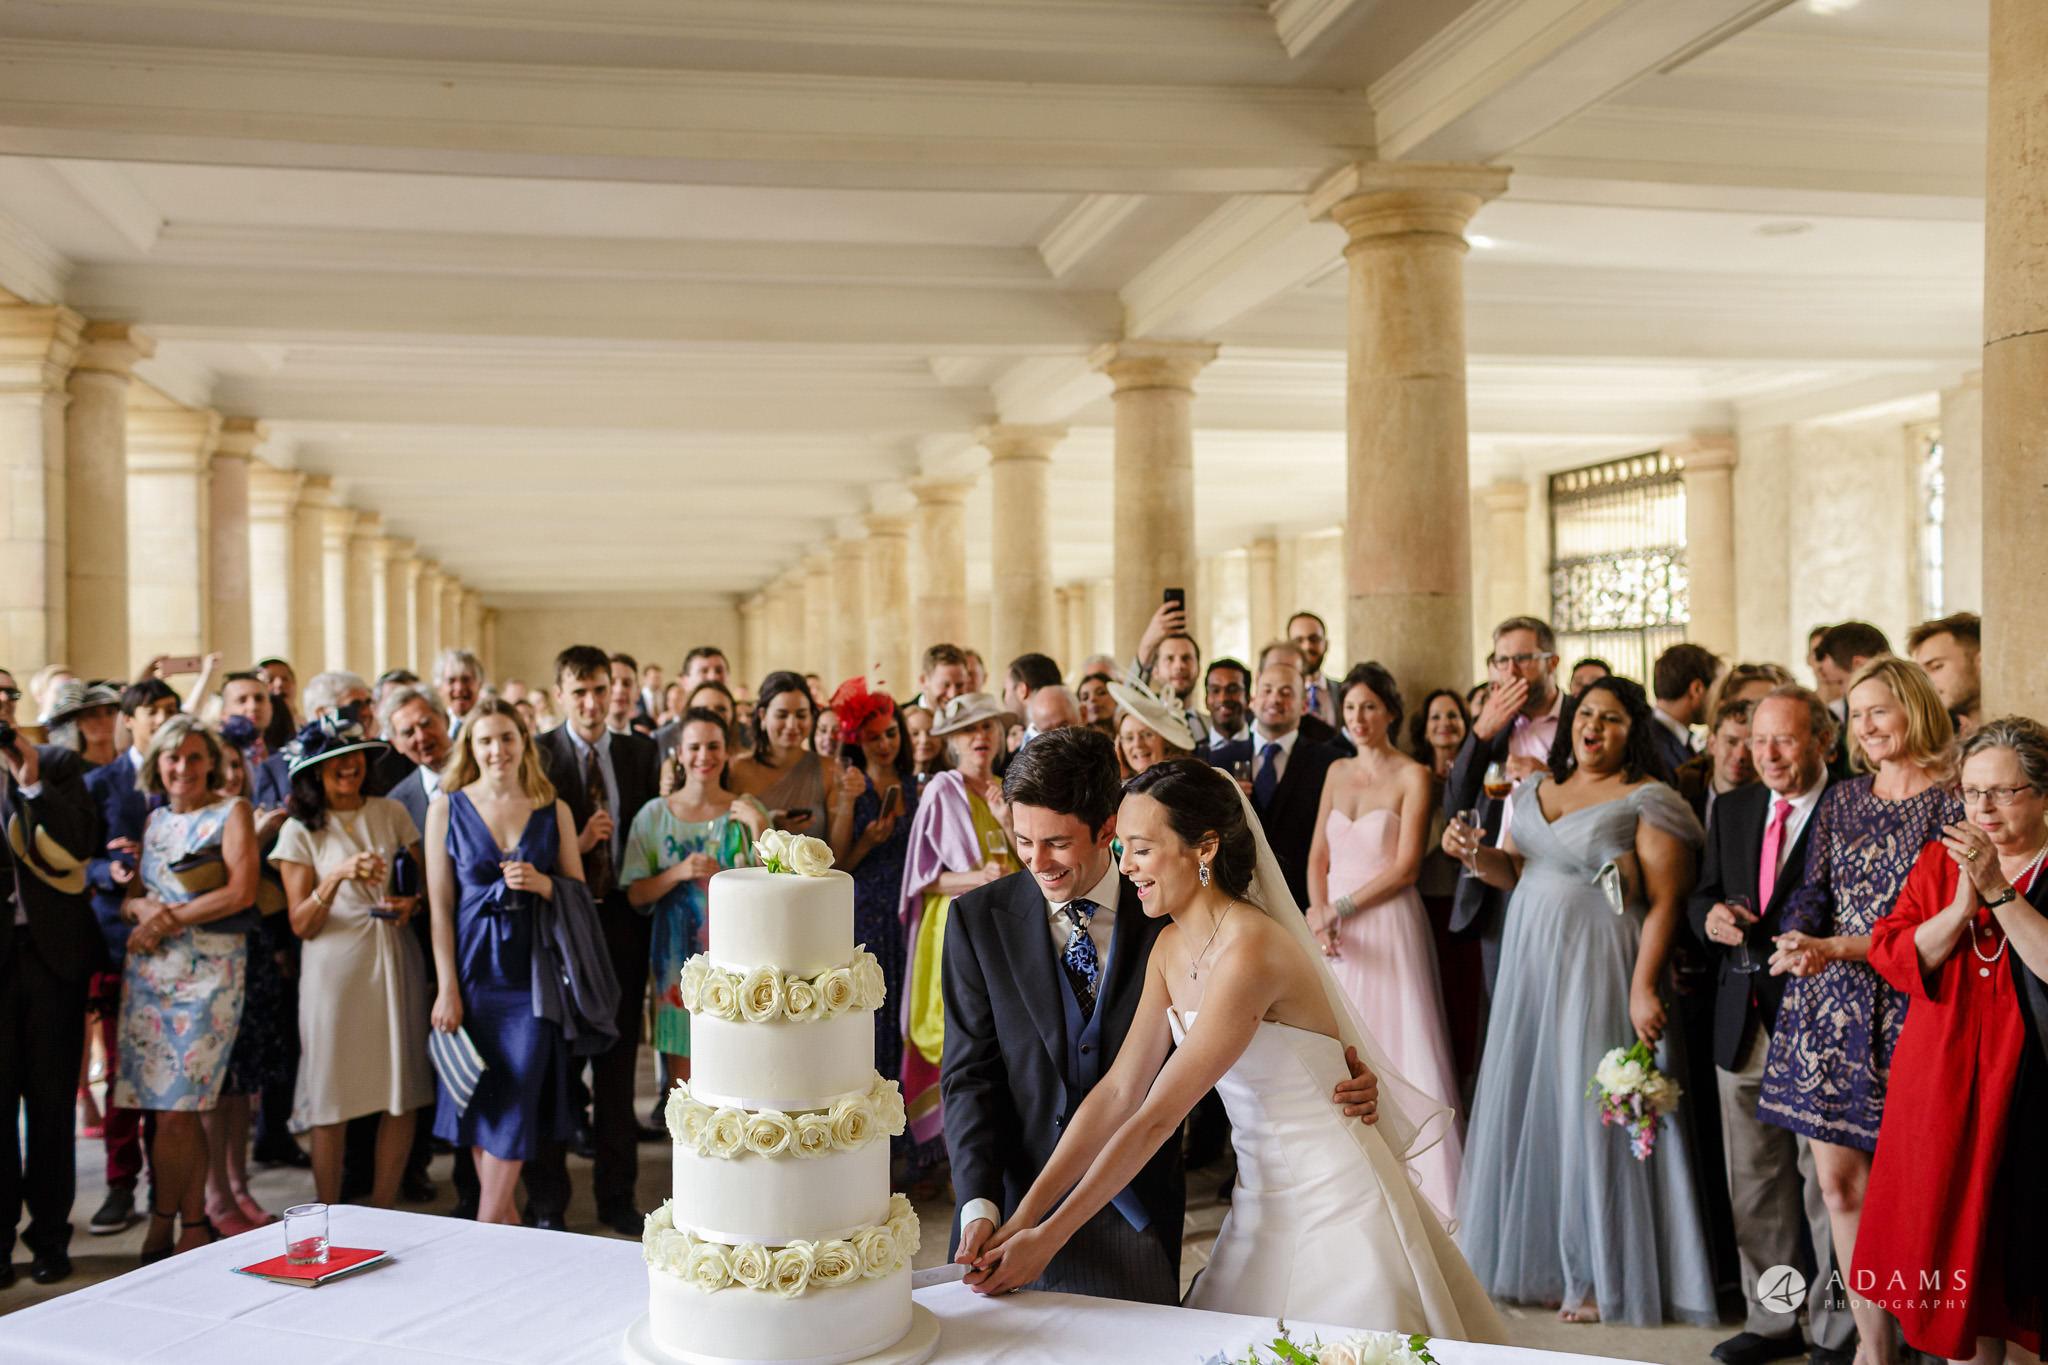 Trinity College Cambridge wedding cake cutting